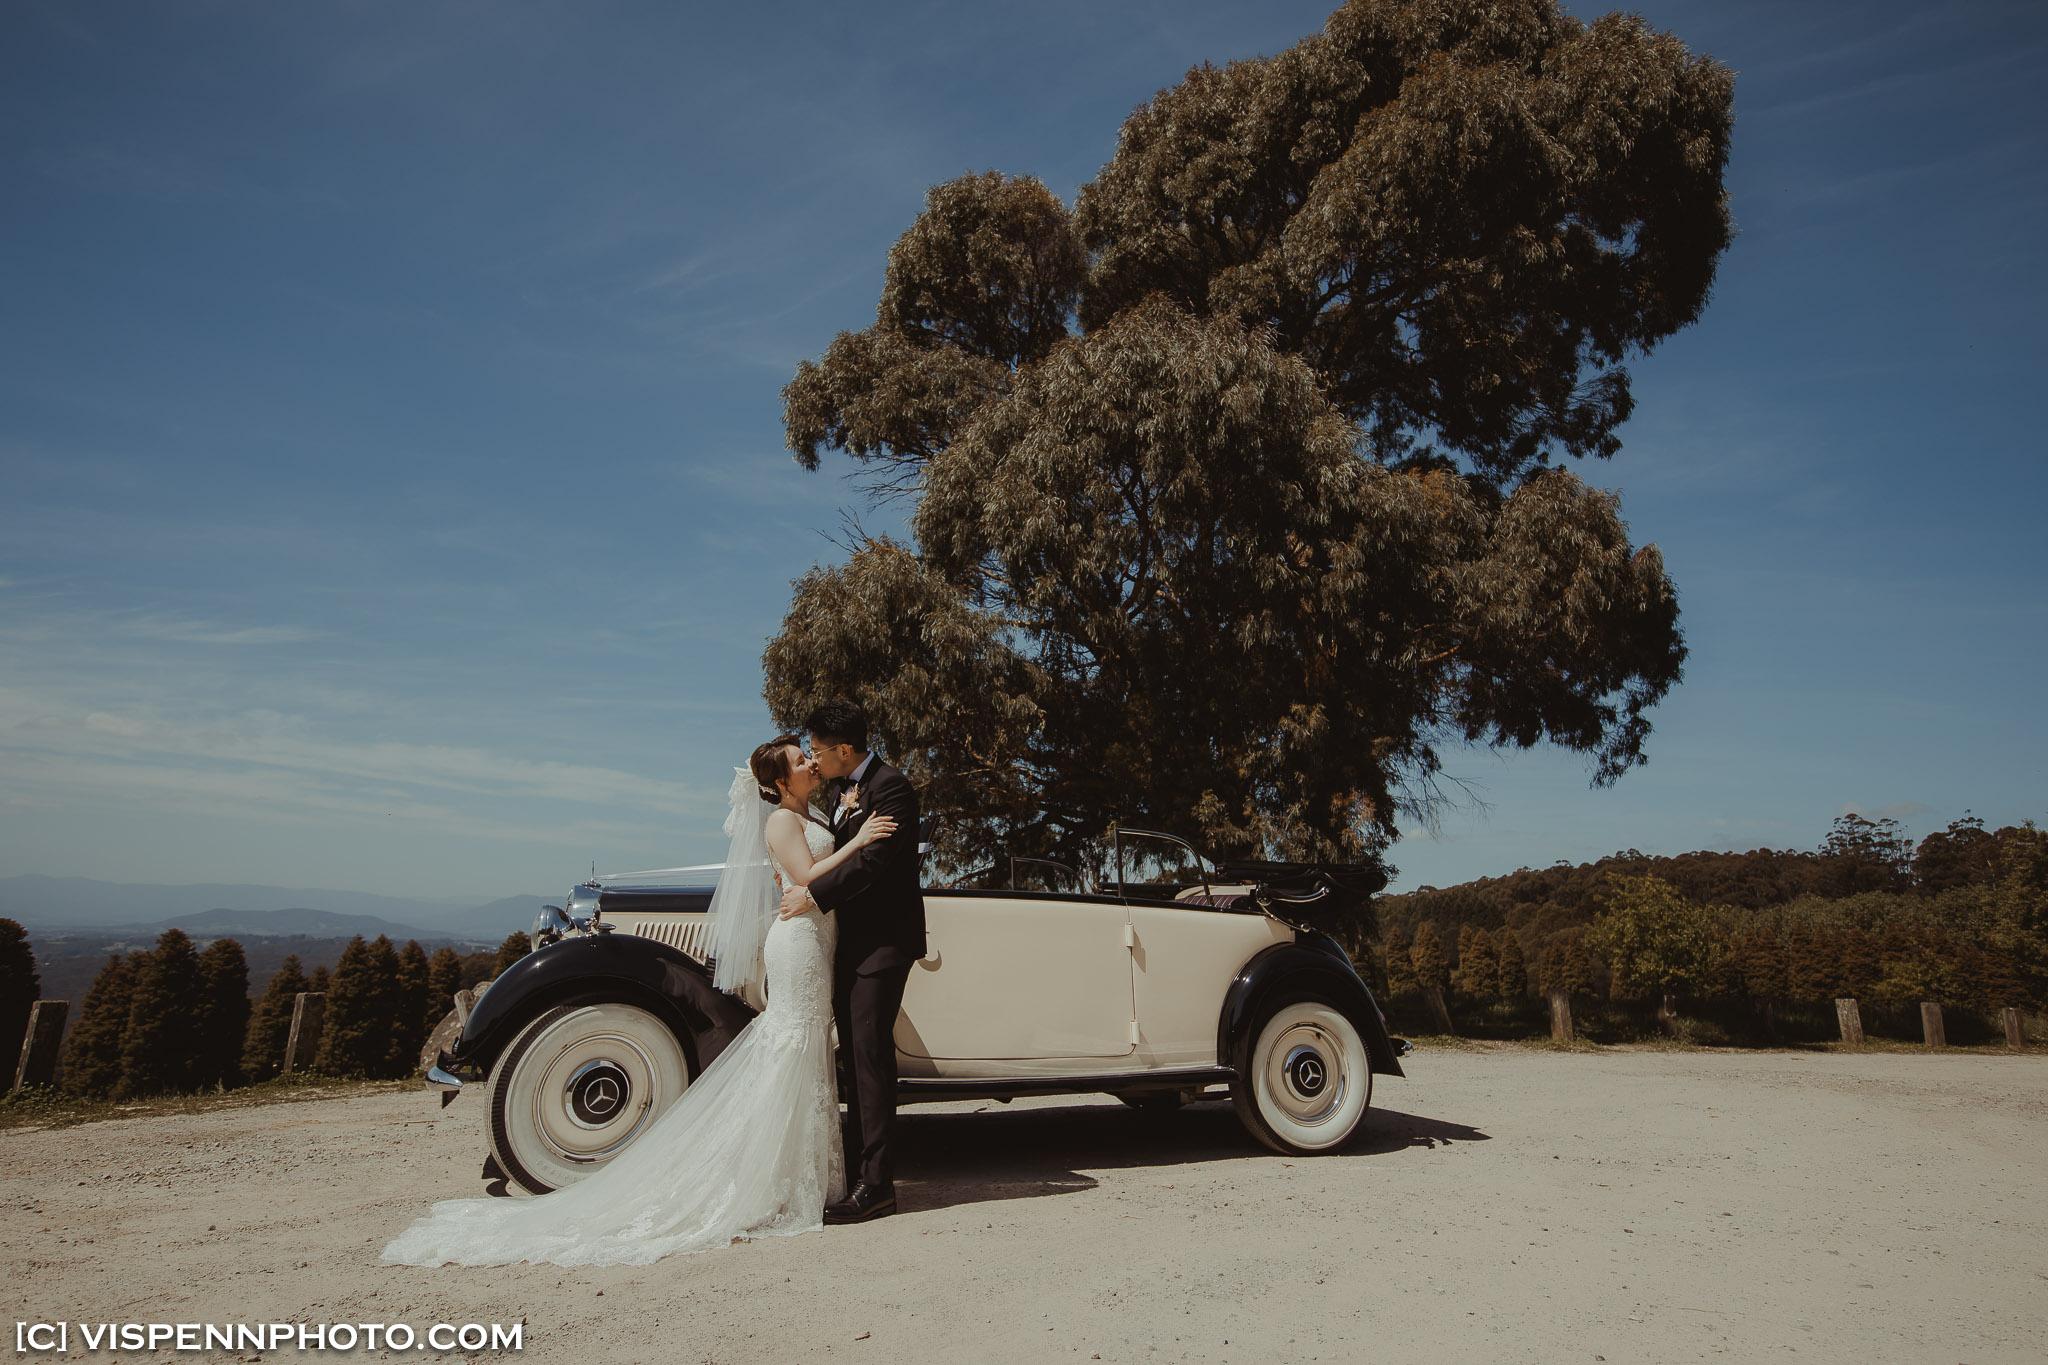 WEDDING DAY Photography Melbourne VISPENN 墨尔本 婚礼跟拍 婚礼摄像 婚礼摄影 结婚照 登记照 ElitaPB 05865 3P 5D4 VISPENN